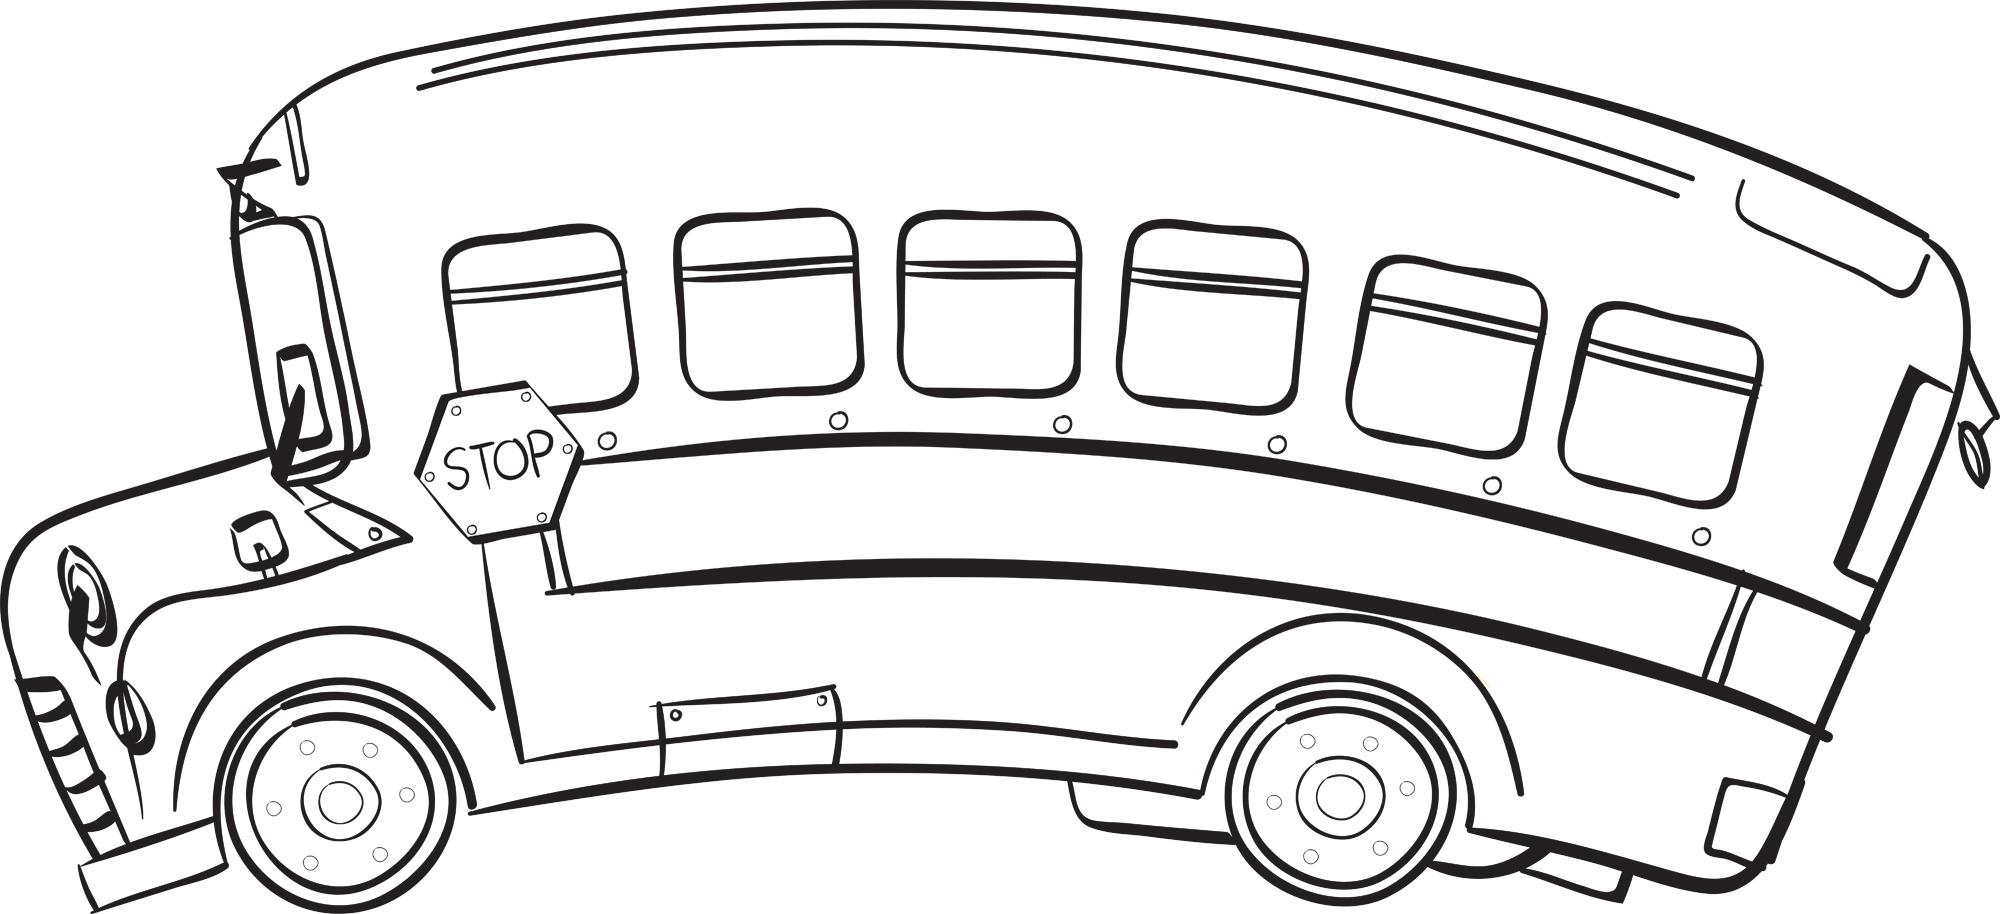 Black and white school bus lights clipart clip Free Bus Clipart Black And White, Download Free Clip Art, Free Clip ... clip